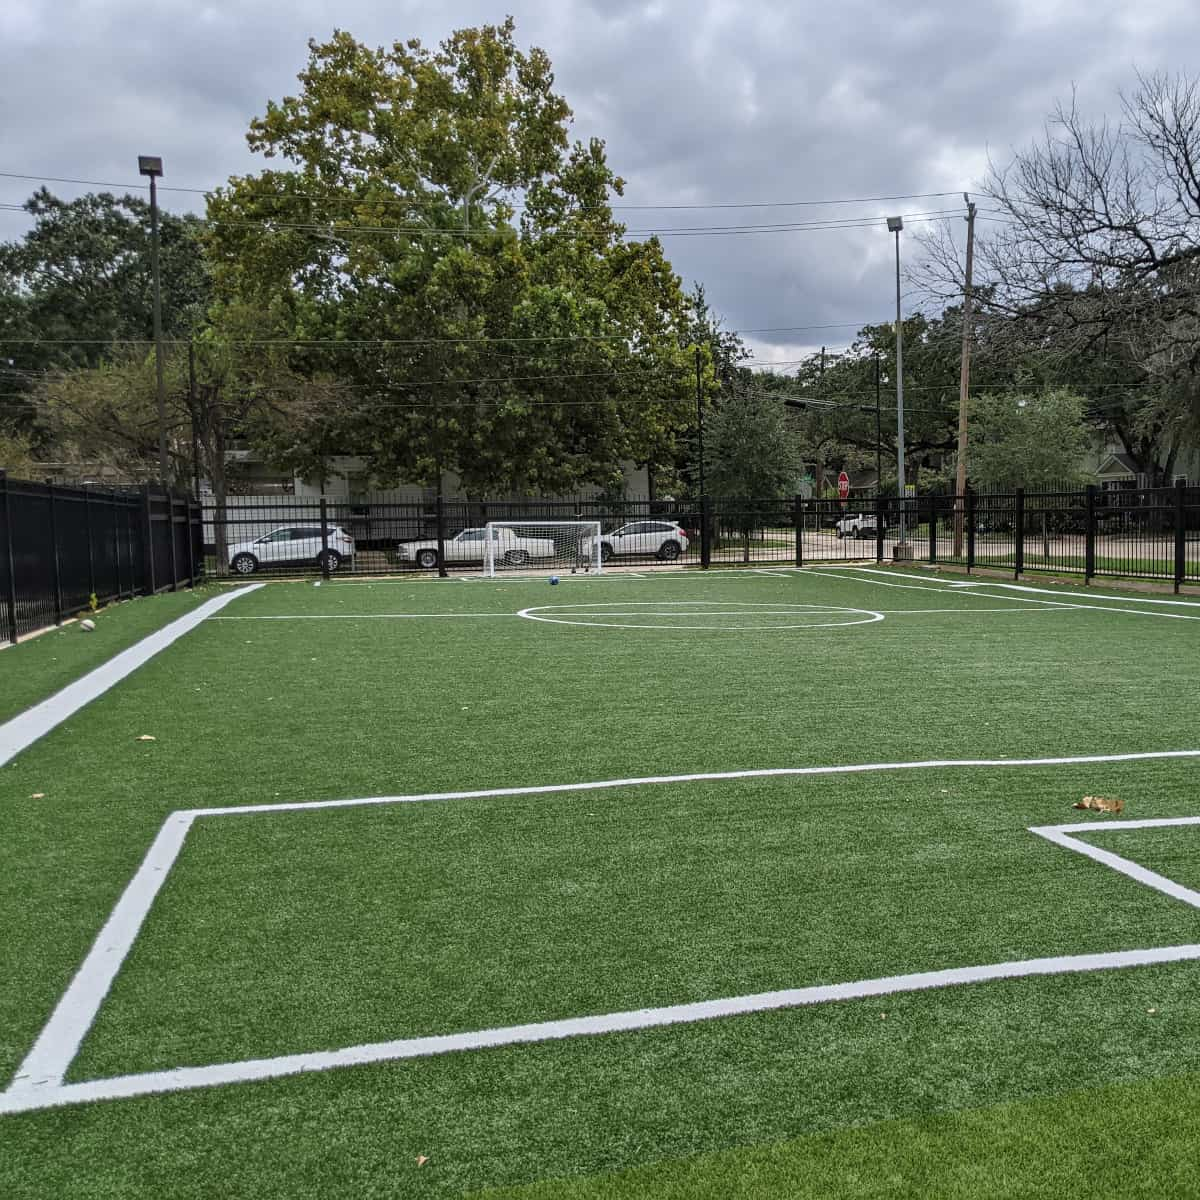 Arabic Immersion School Spark Park Soccer Field